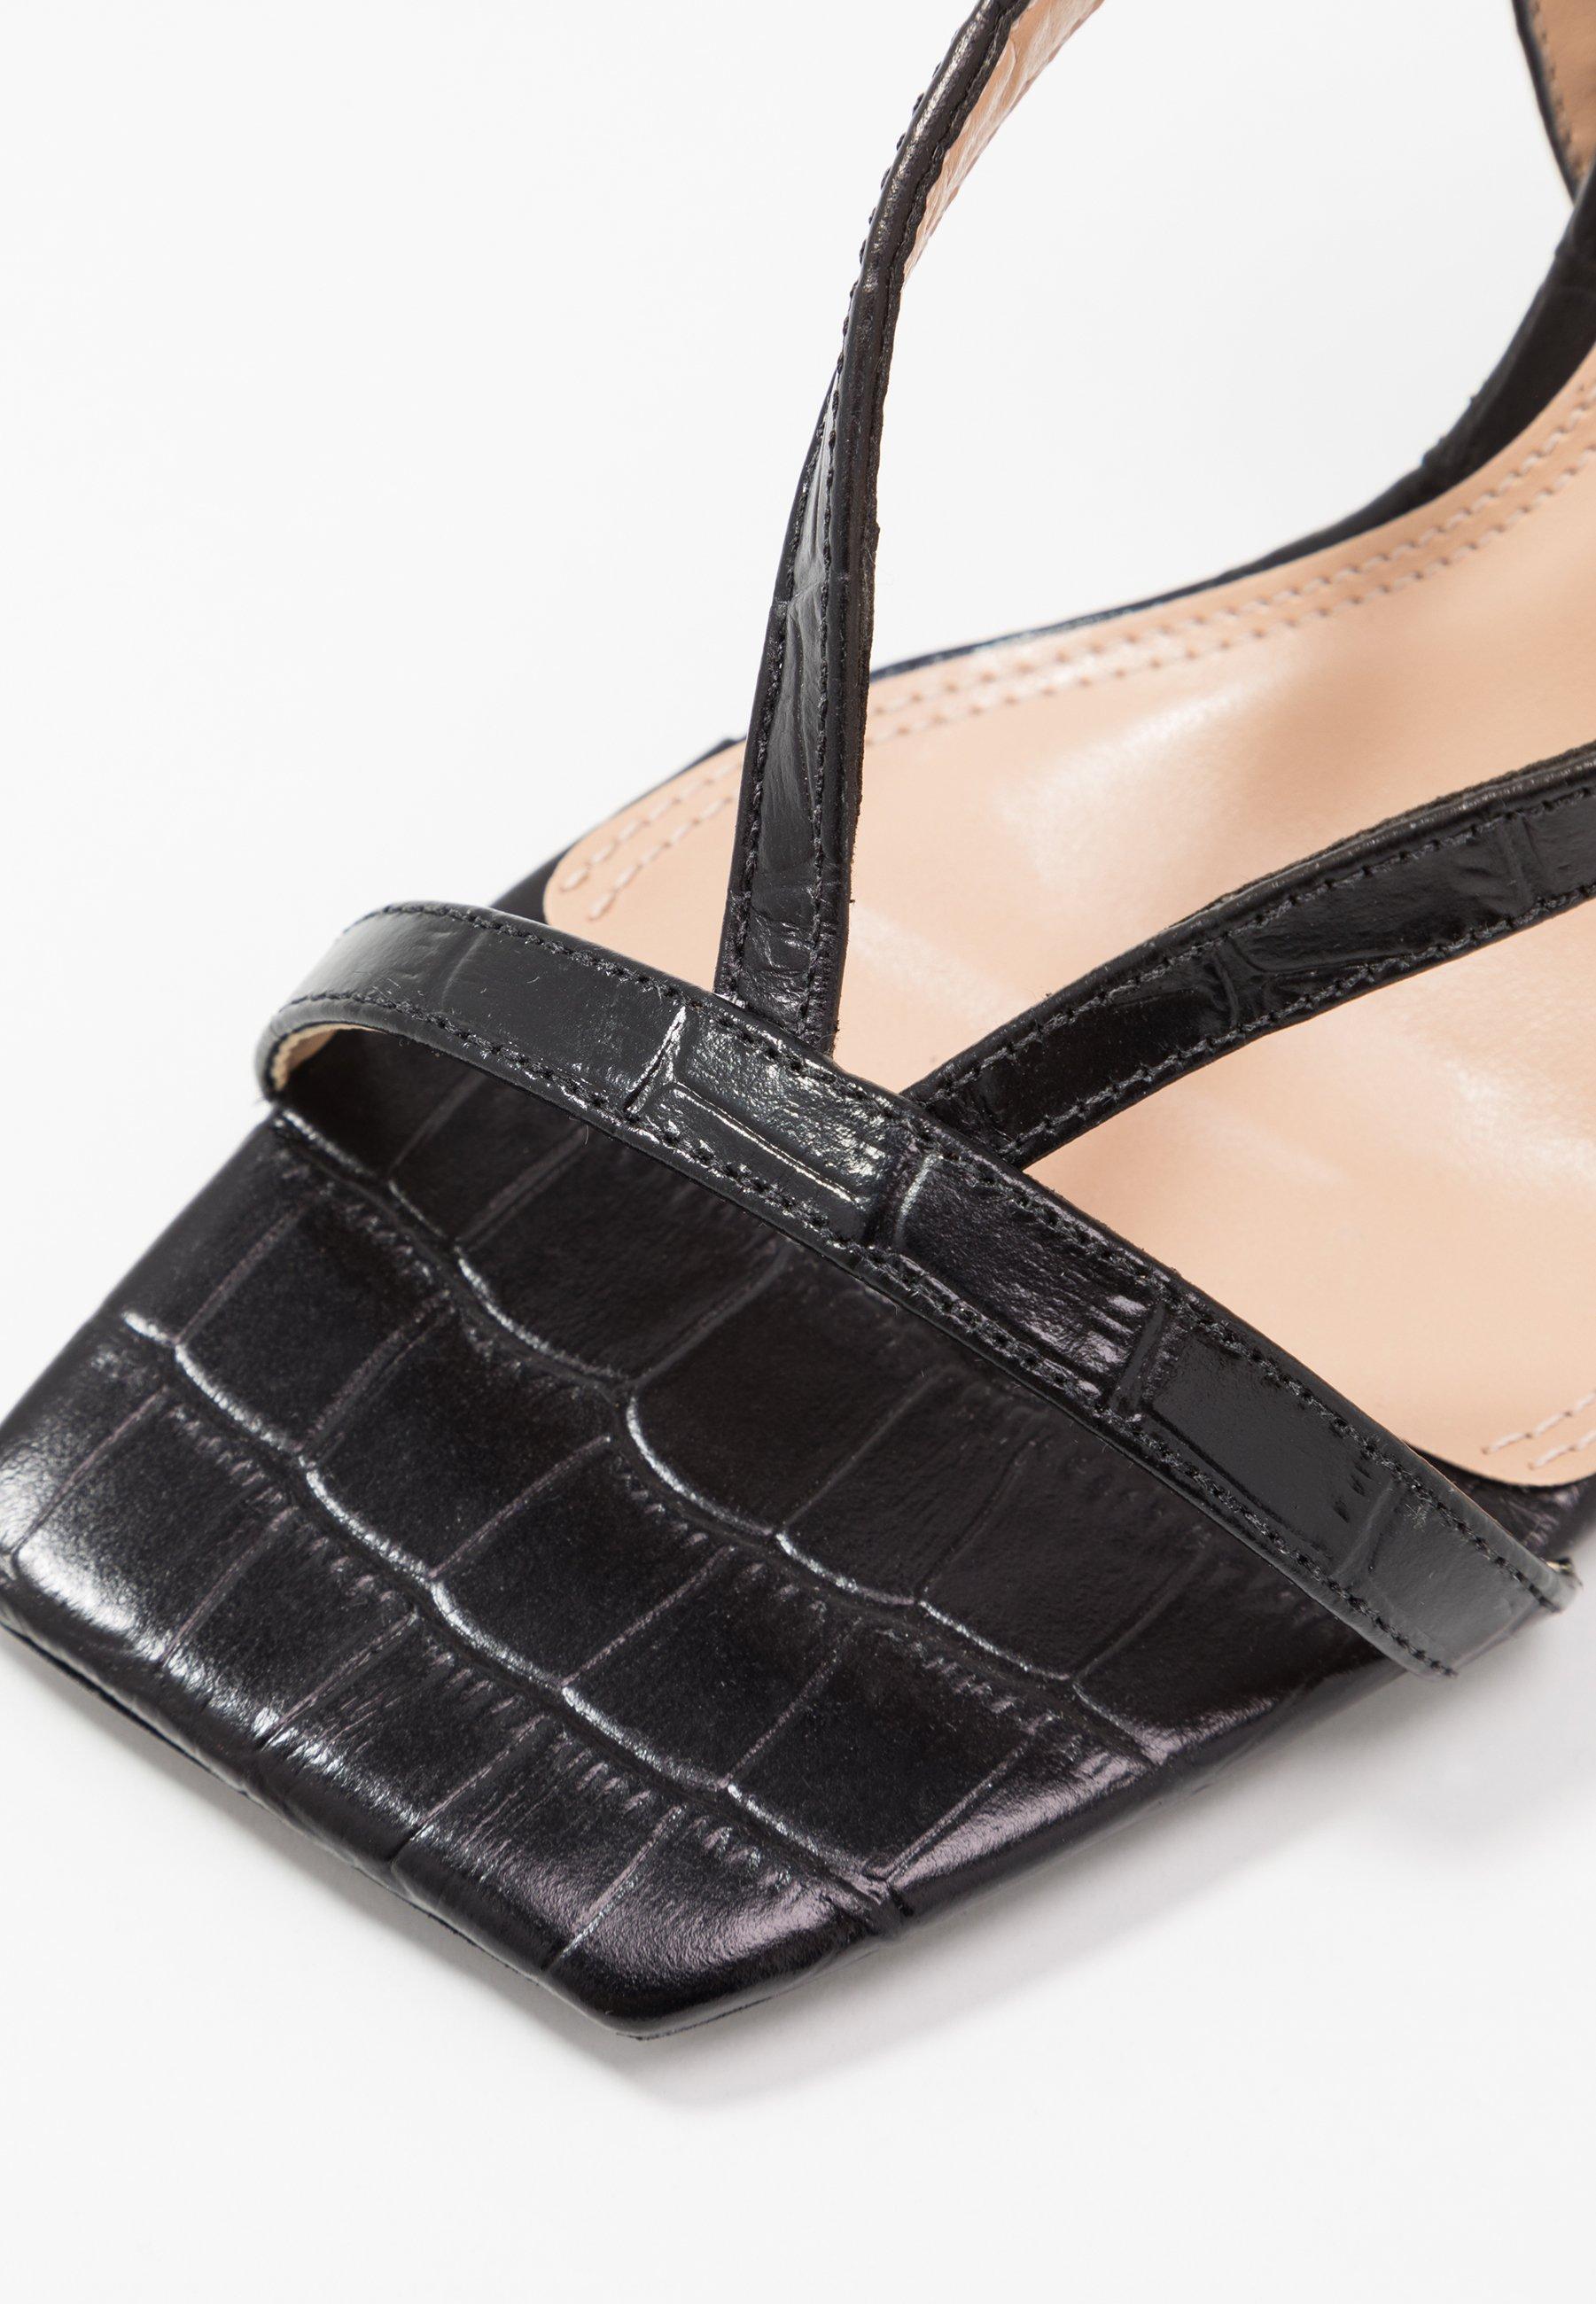 Dune London Monterey - High Heeled Sandals Black